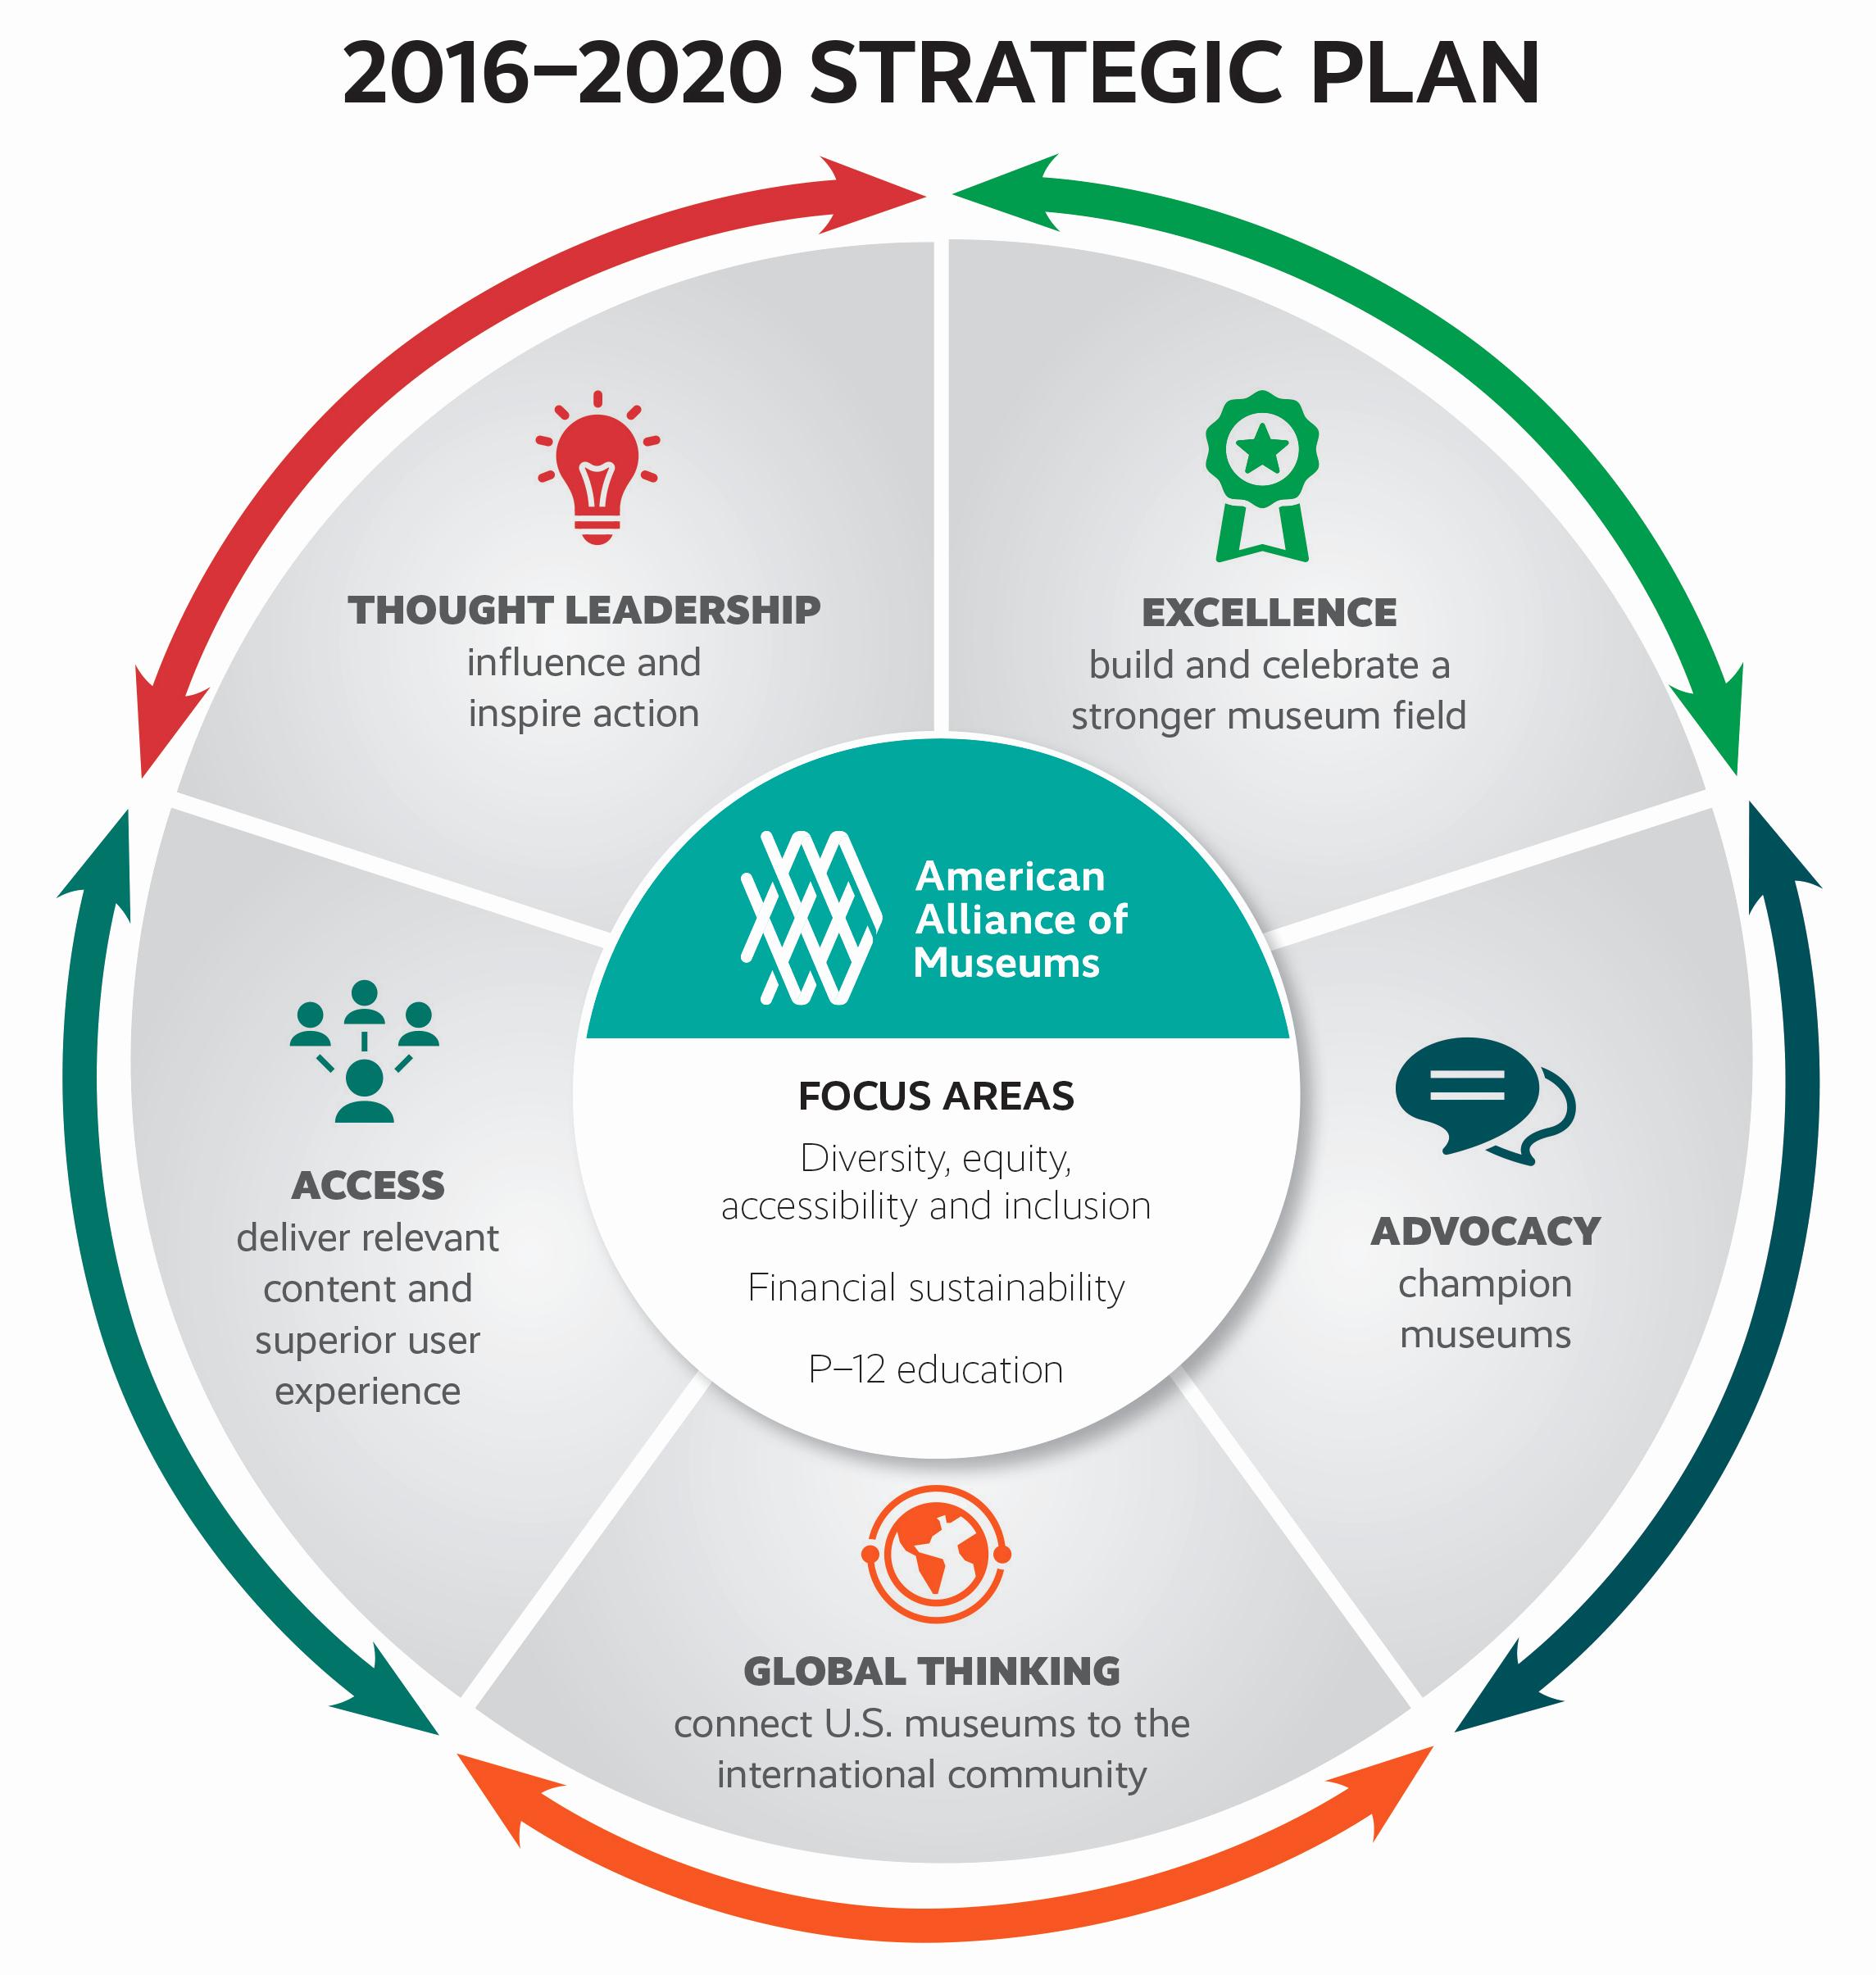 Strategic Action Plan Template Inspirational Strategic Plan Graphic Google Search